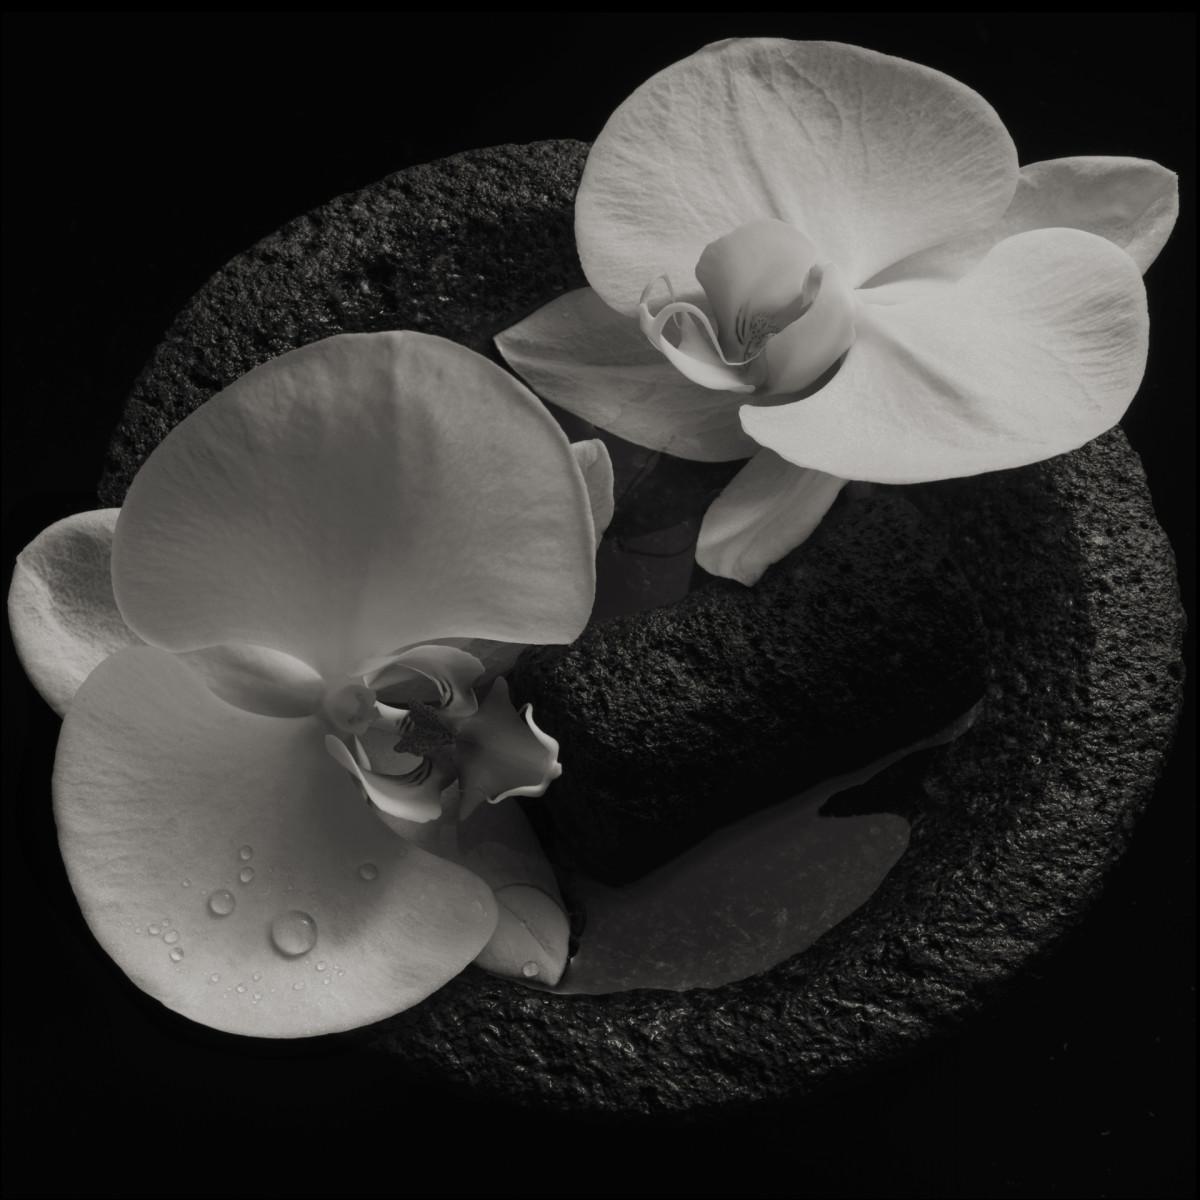 Mike Patton new album Corpse Flower